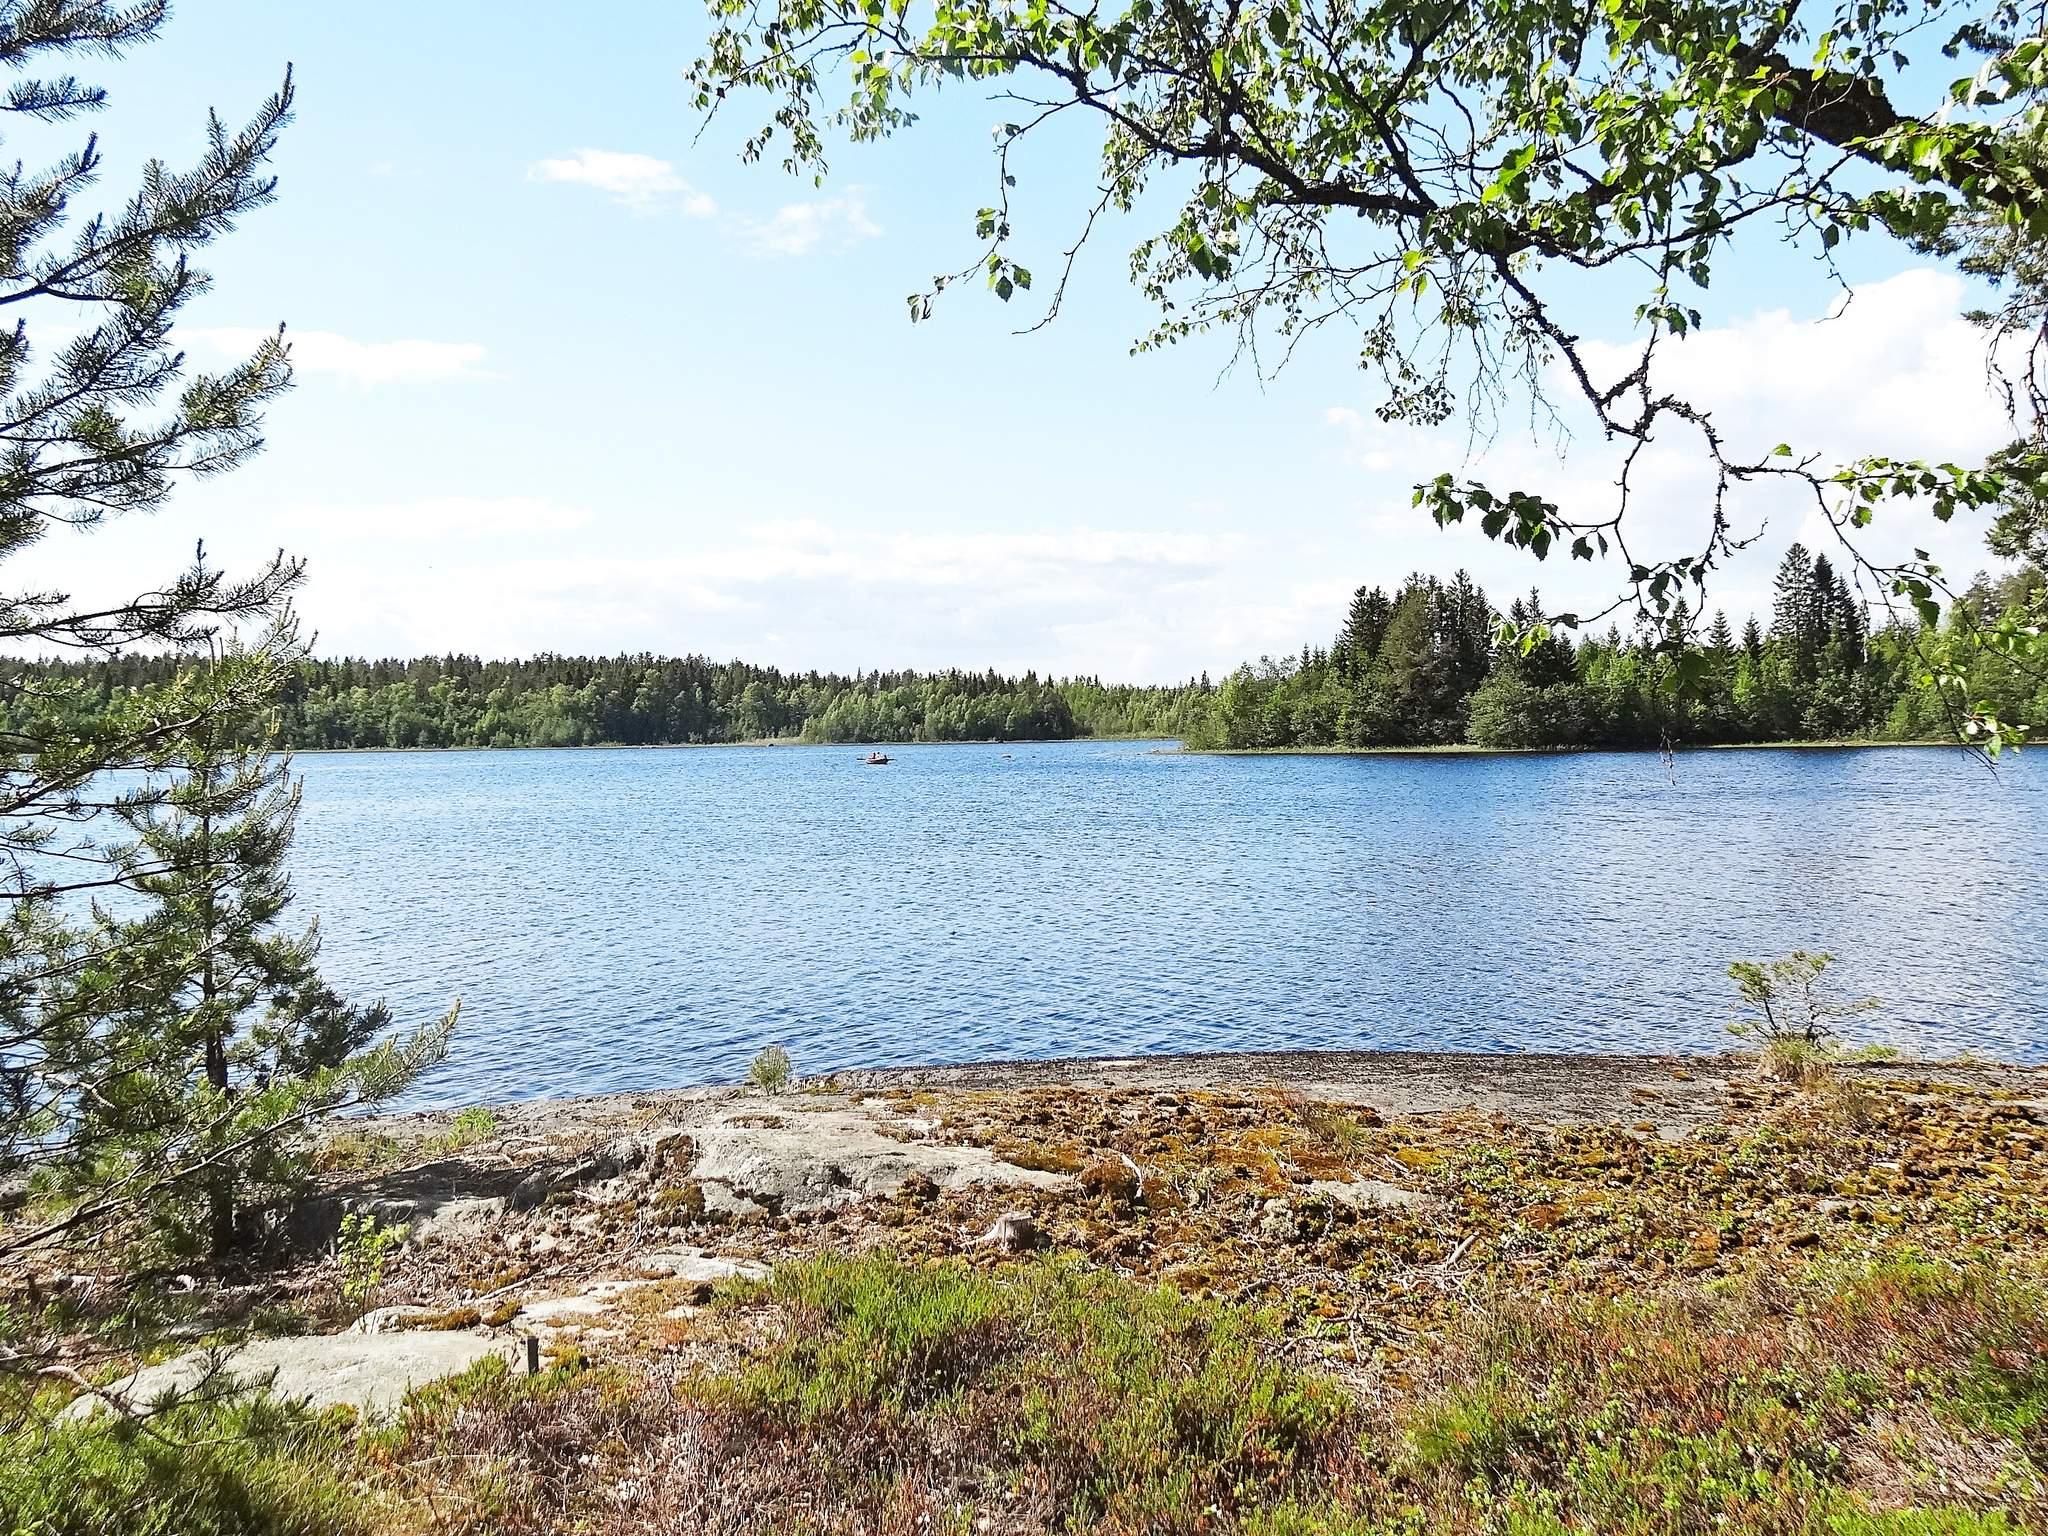 Ferienhaus Nordmaling (1026050), Lögdeå, Västerbottens län, Nordschweden, Schweden, Bild 23